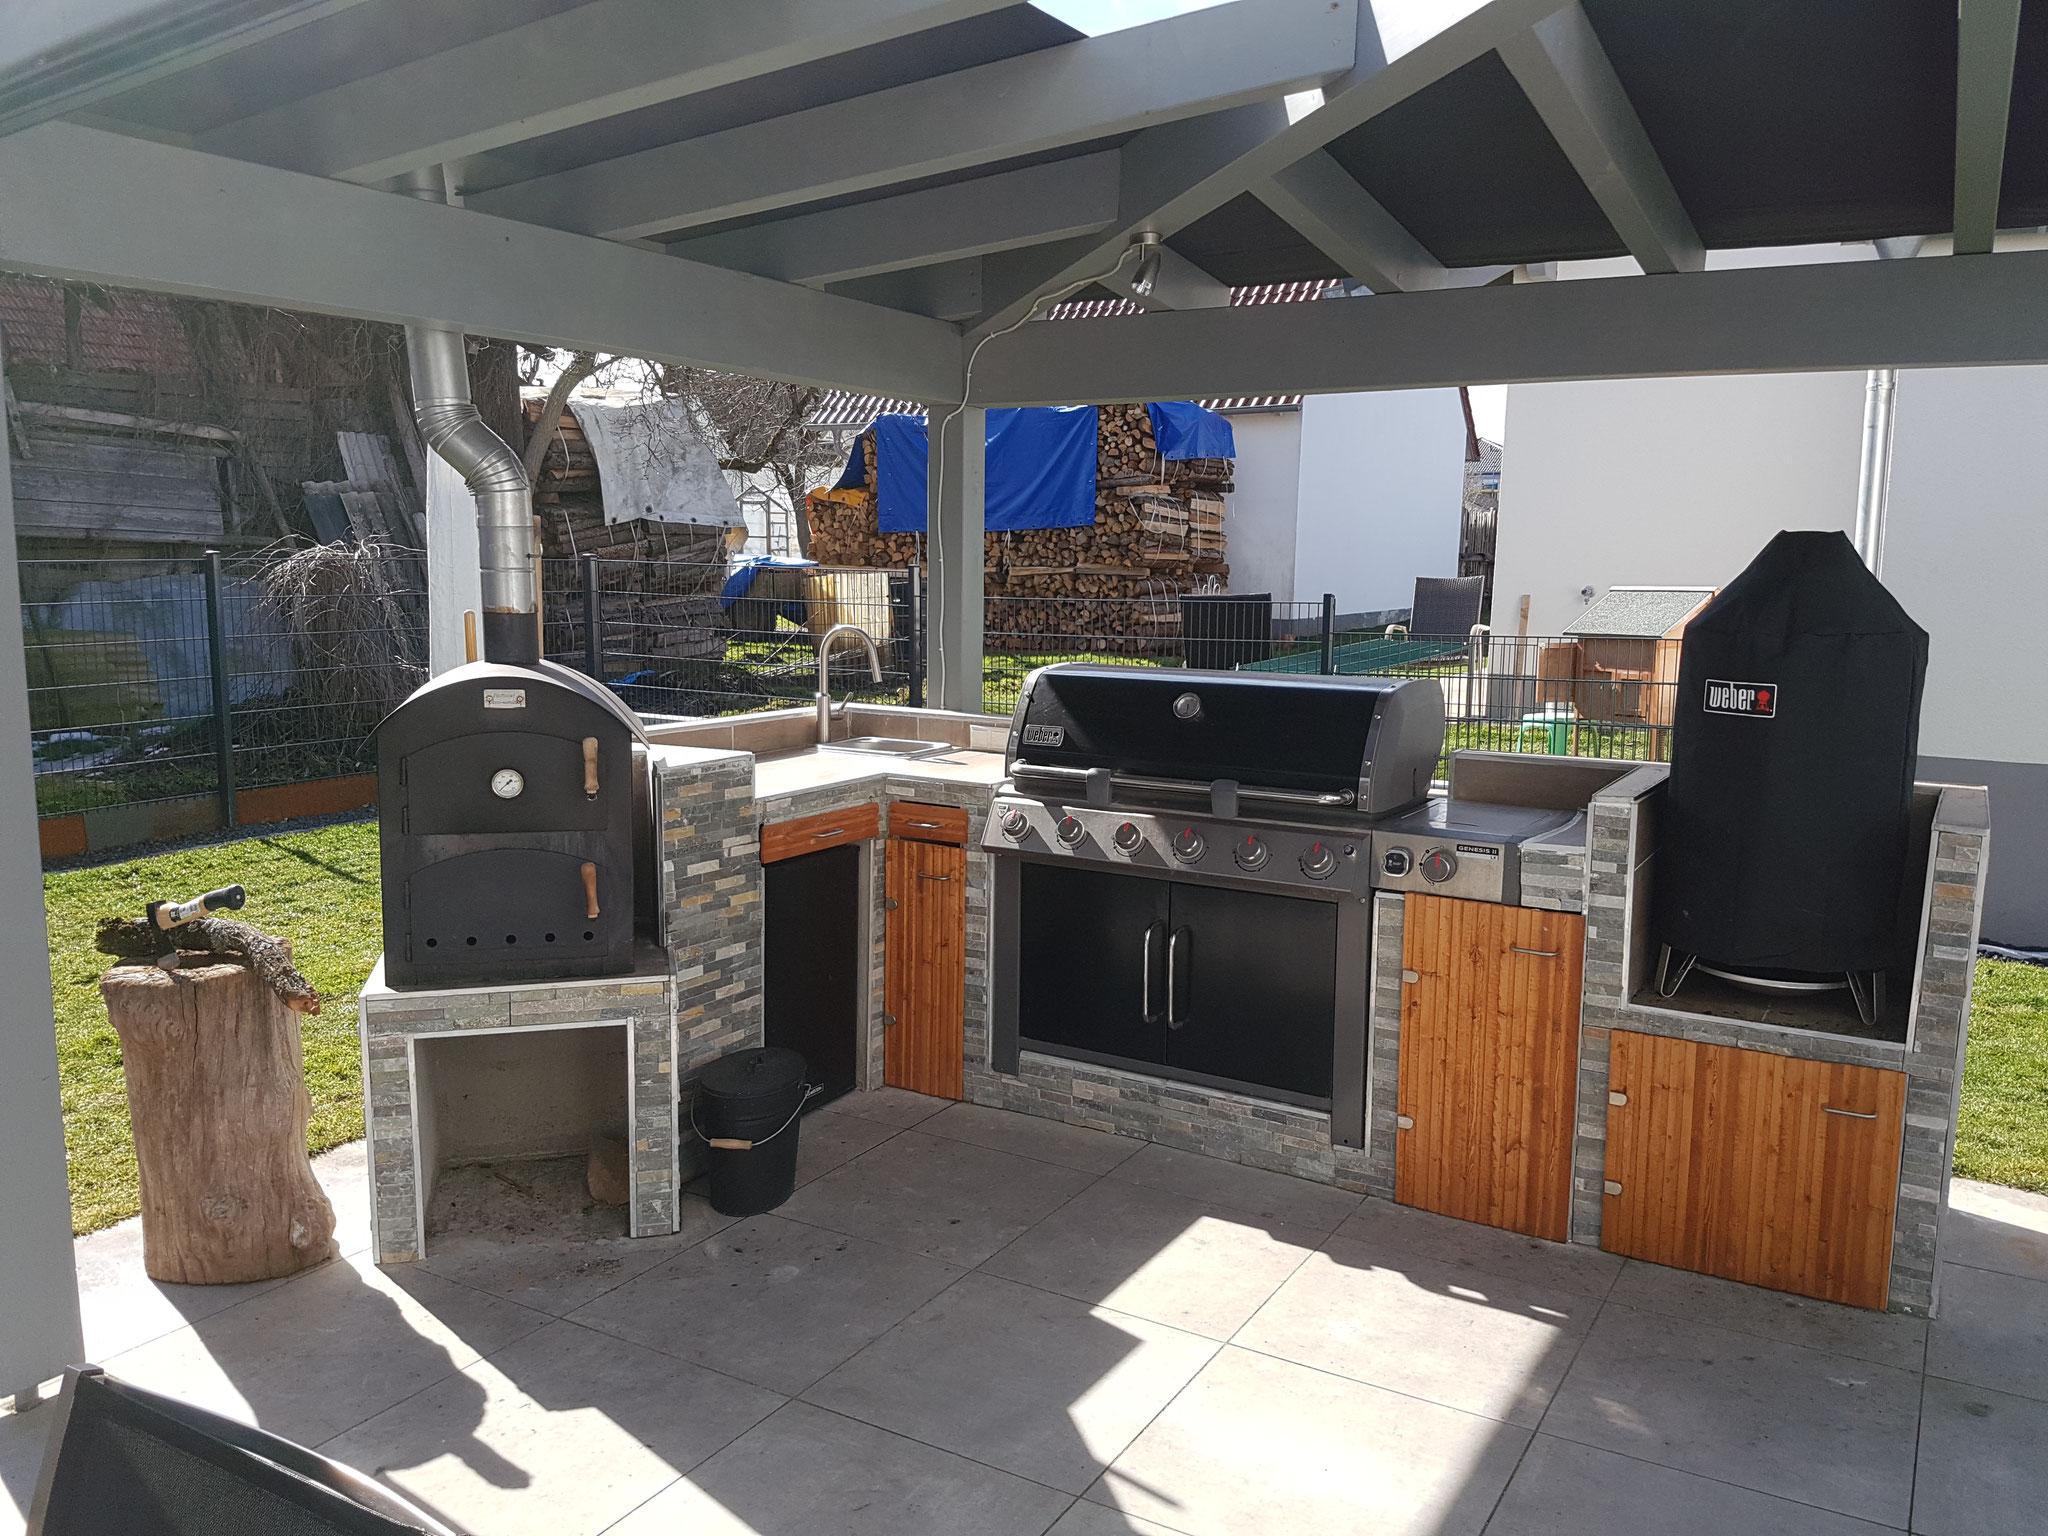 Weber Outdoor Küche Preise : Outdoor küche edelstahl weber gaskochfeld outdoor küche gemauerte